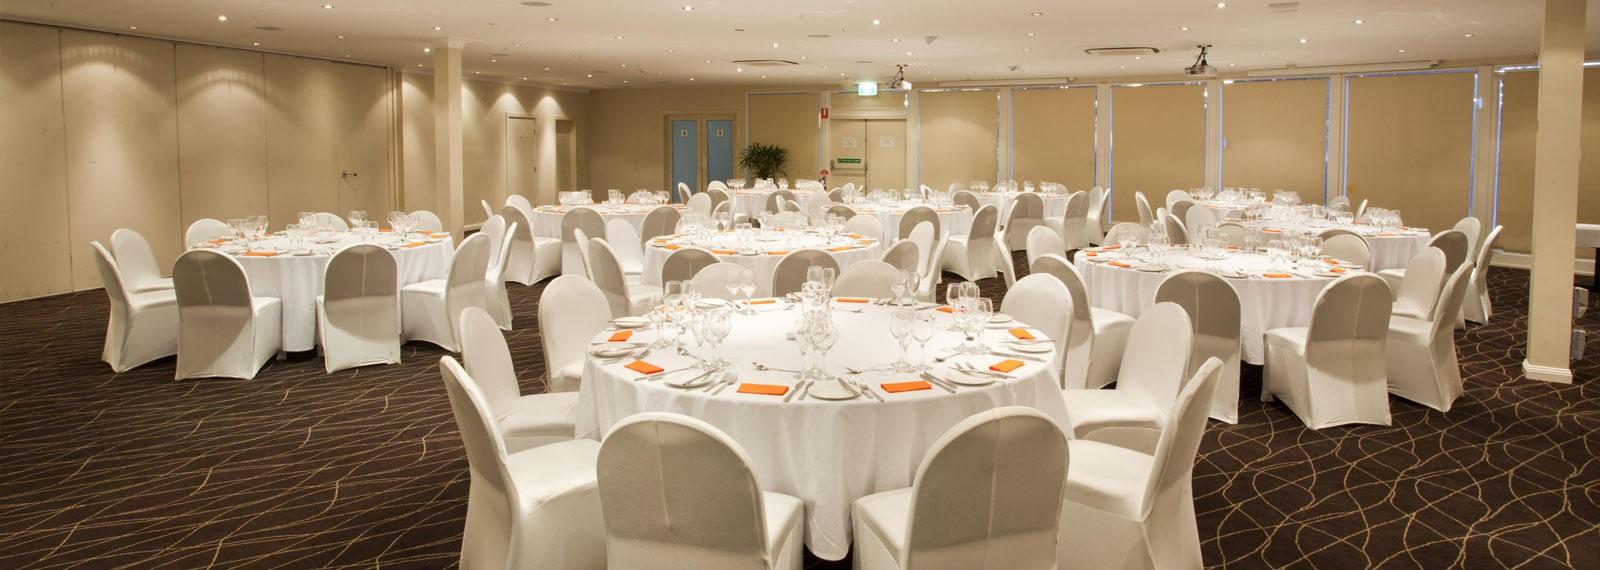 Romantic Wedding Reception Venues Canberra Mercure Canberra